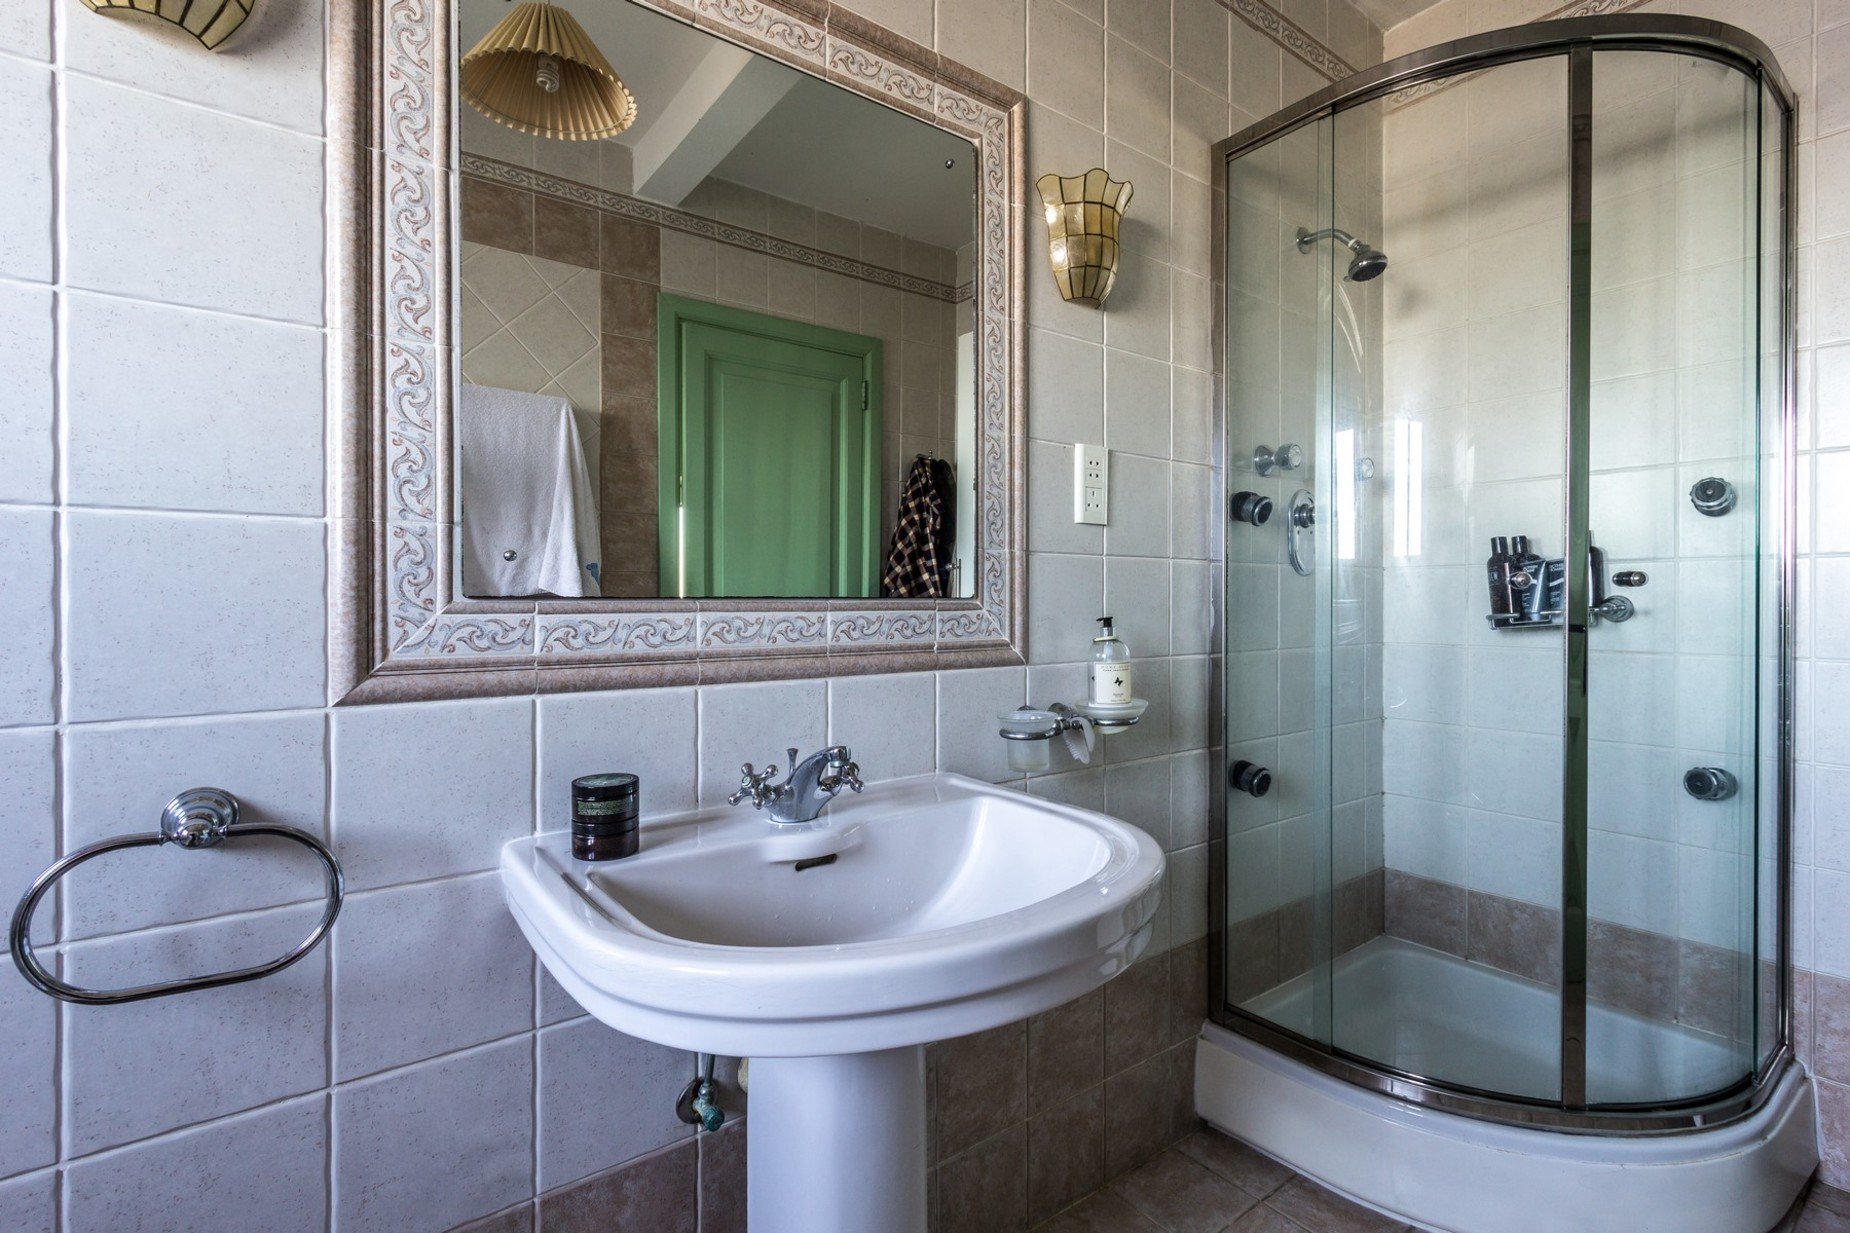 4 bed Villa For Sale in Bahar ic-Caghaq, Bahar ic-Caghaq - thumb 19